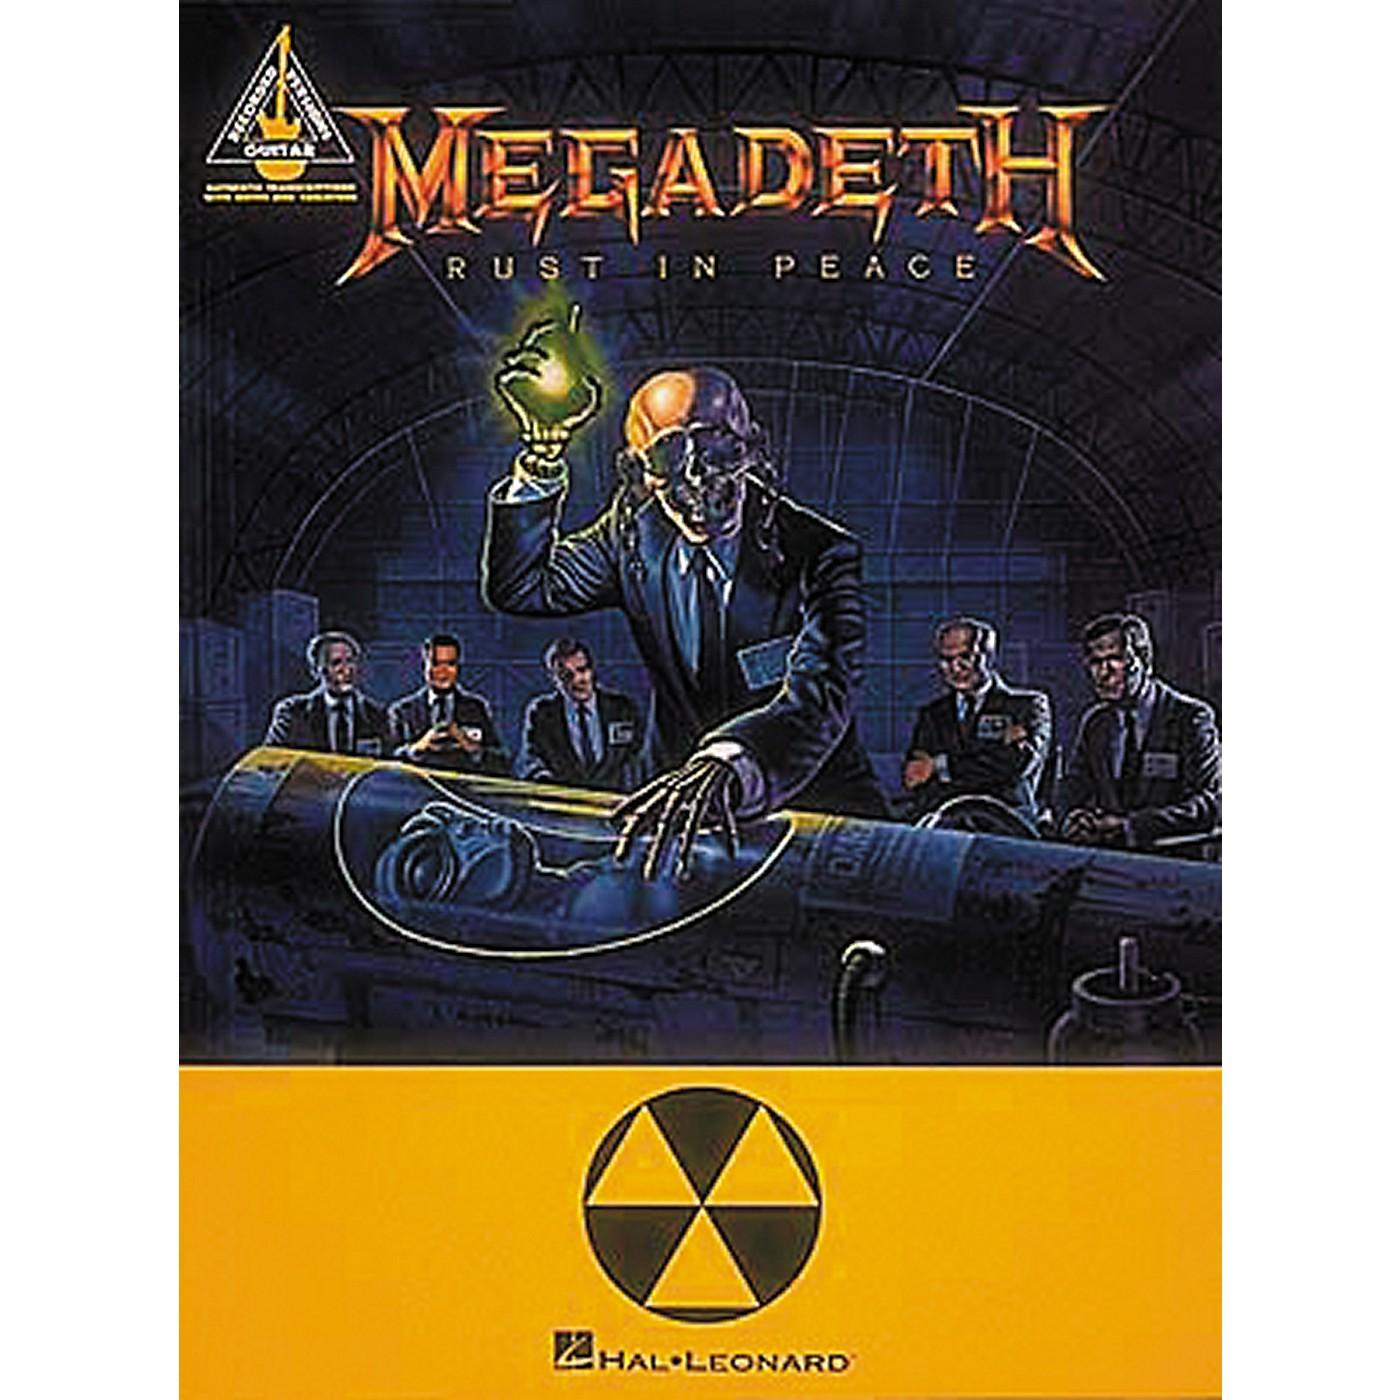 Hal Leonard Megadeth Rust In Peace Guitar Tab Songbook thumbnail